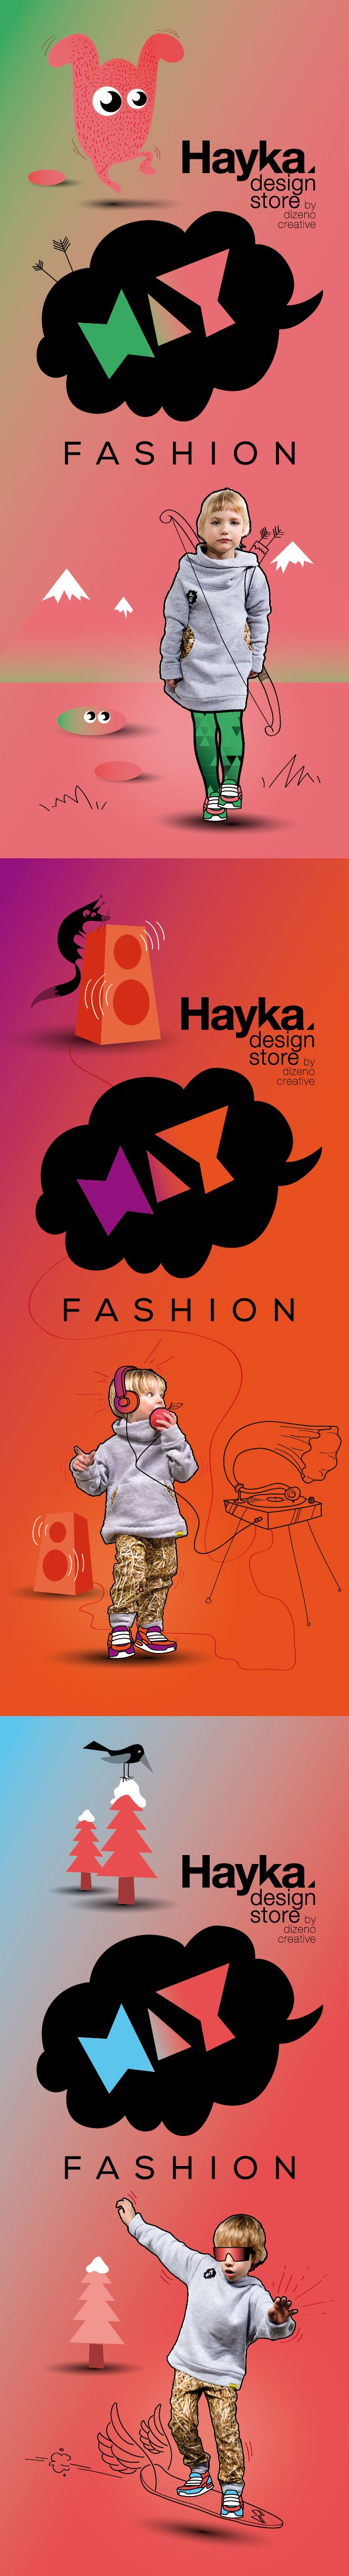 HAY fashion lookbook / by Dizeno Creative / www.hayka.eu